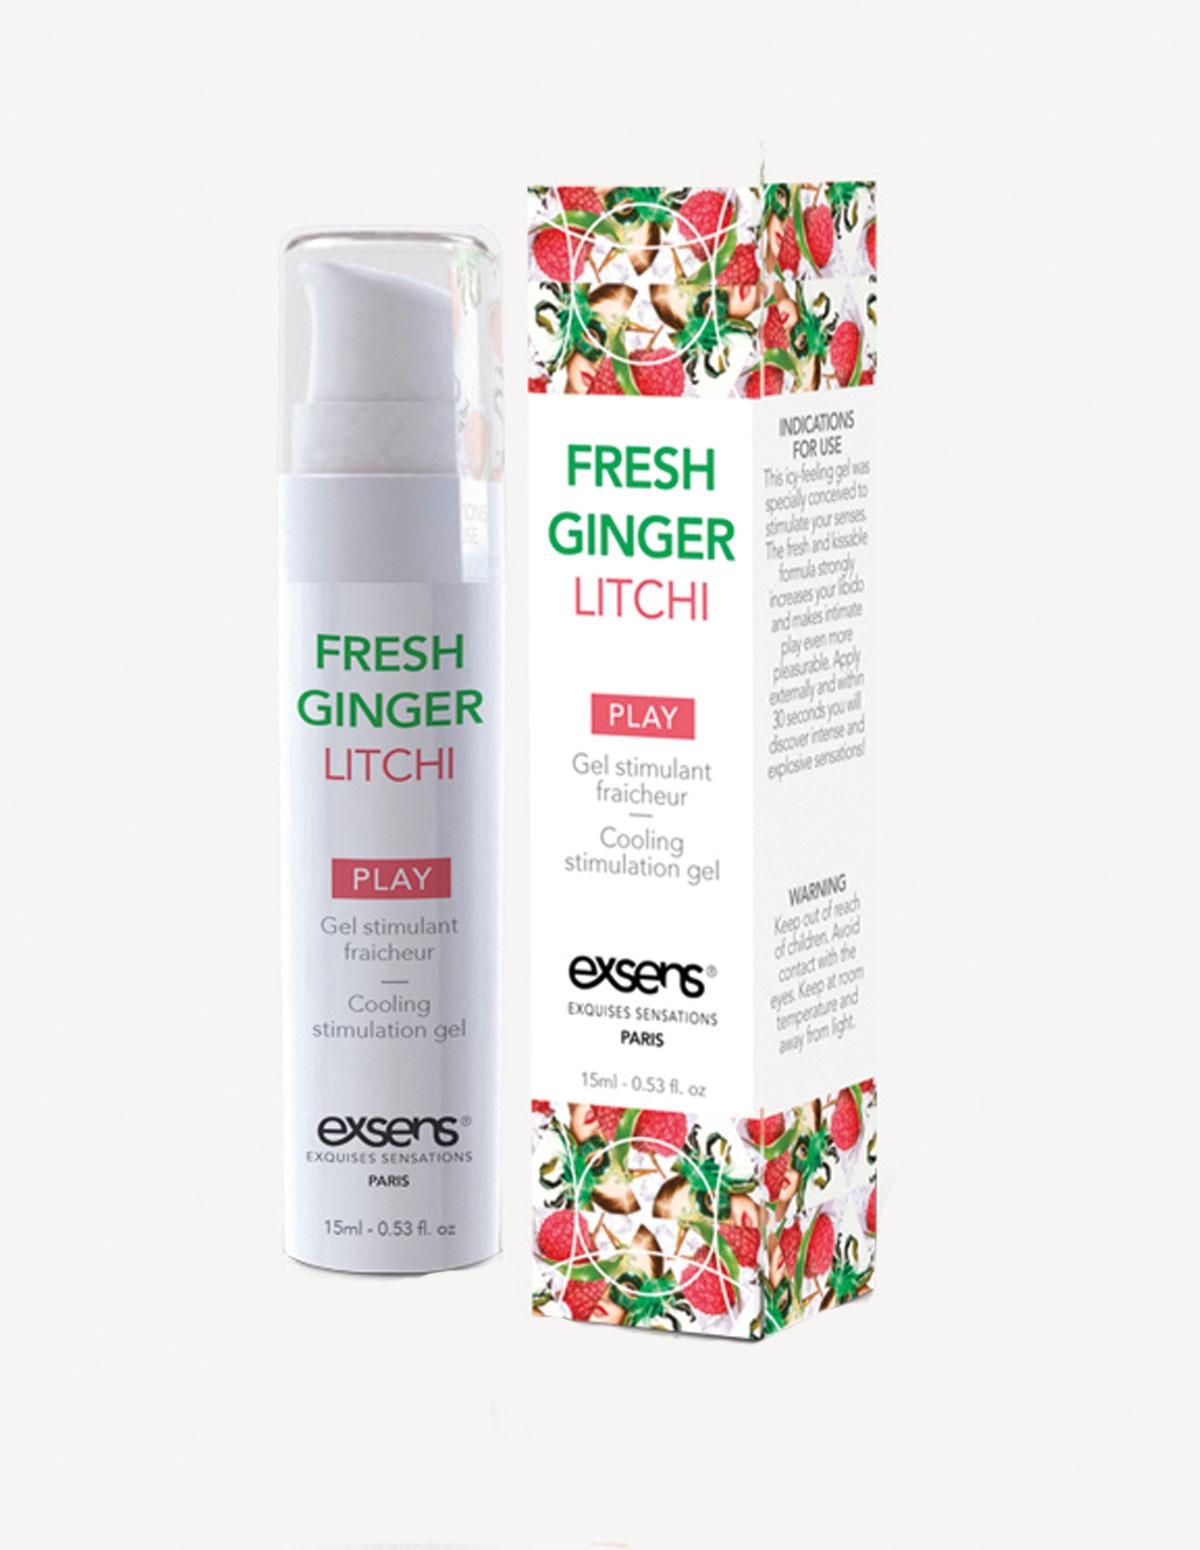 Exsens Ginger Lychee Arousal Gel